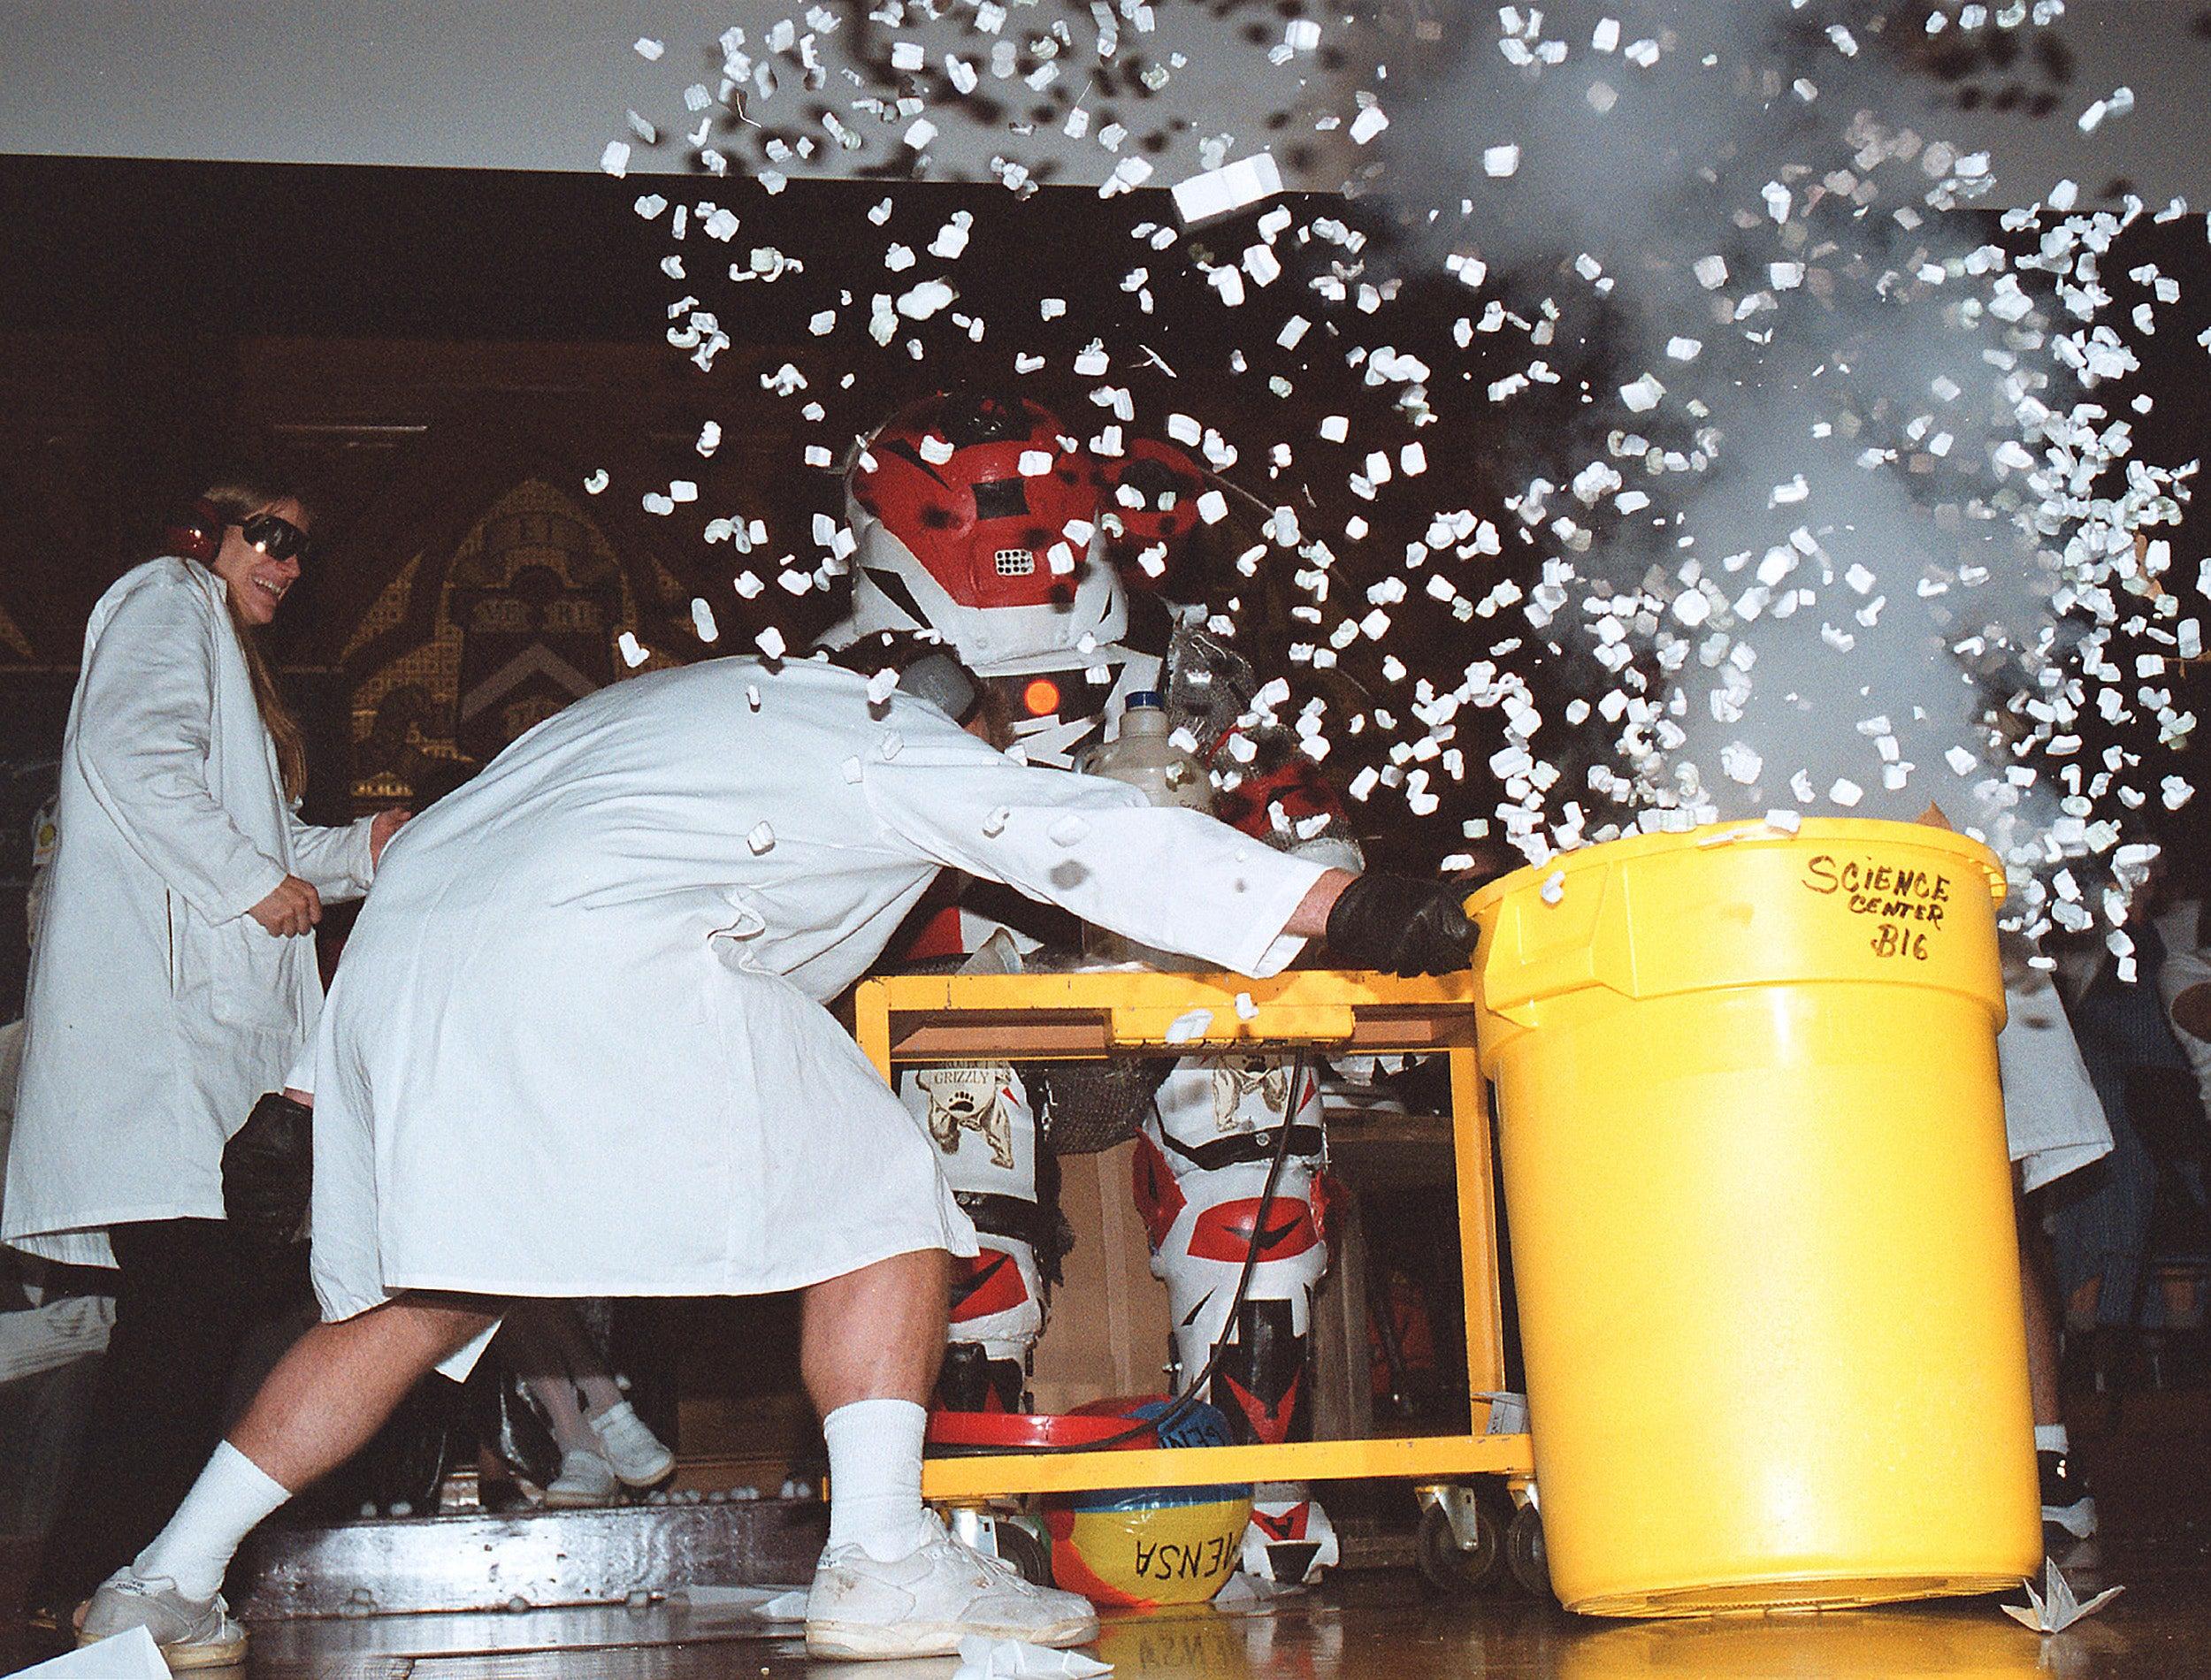 Scientists explode a barrel of confetti